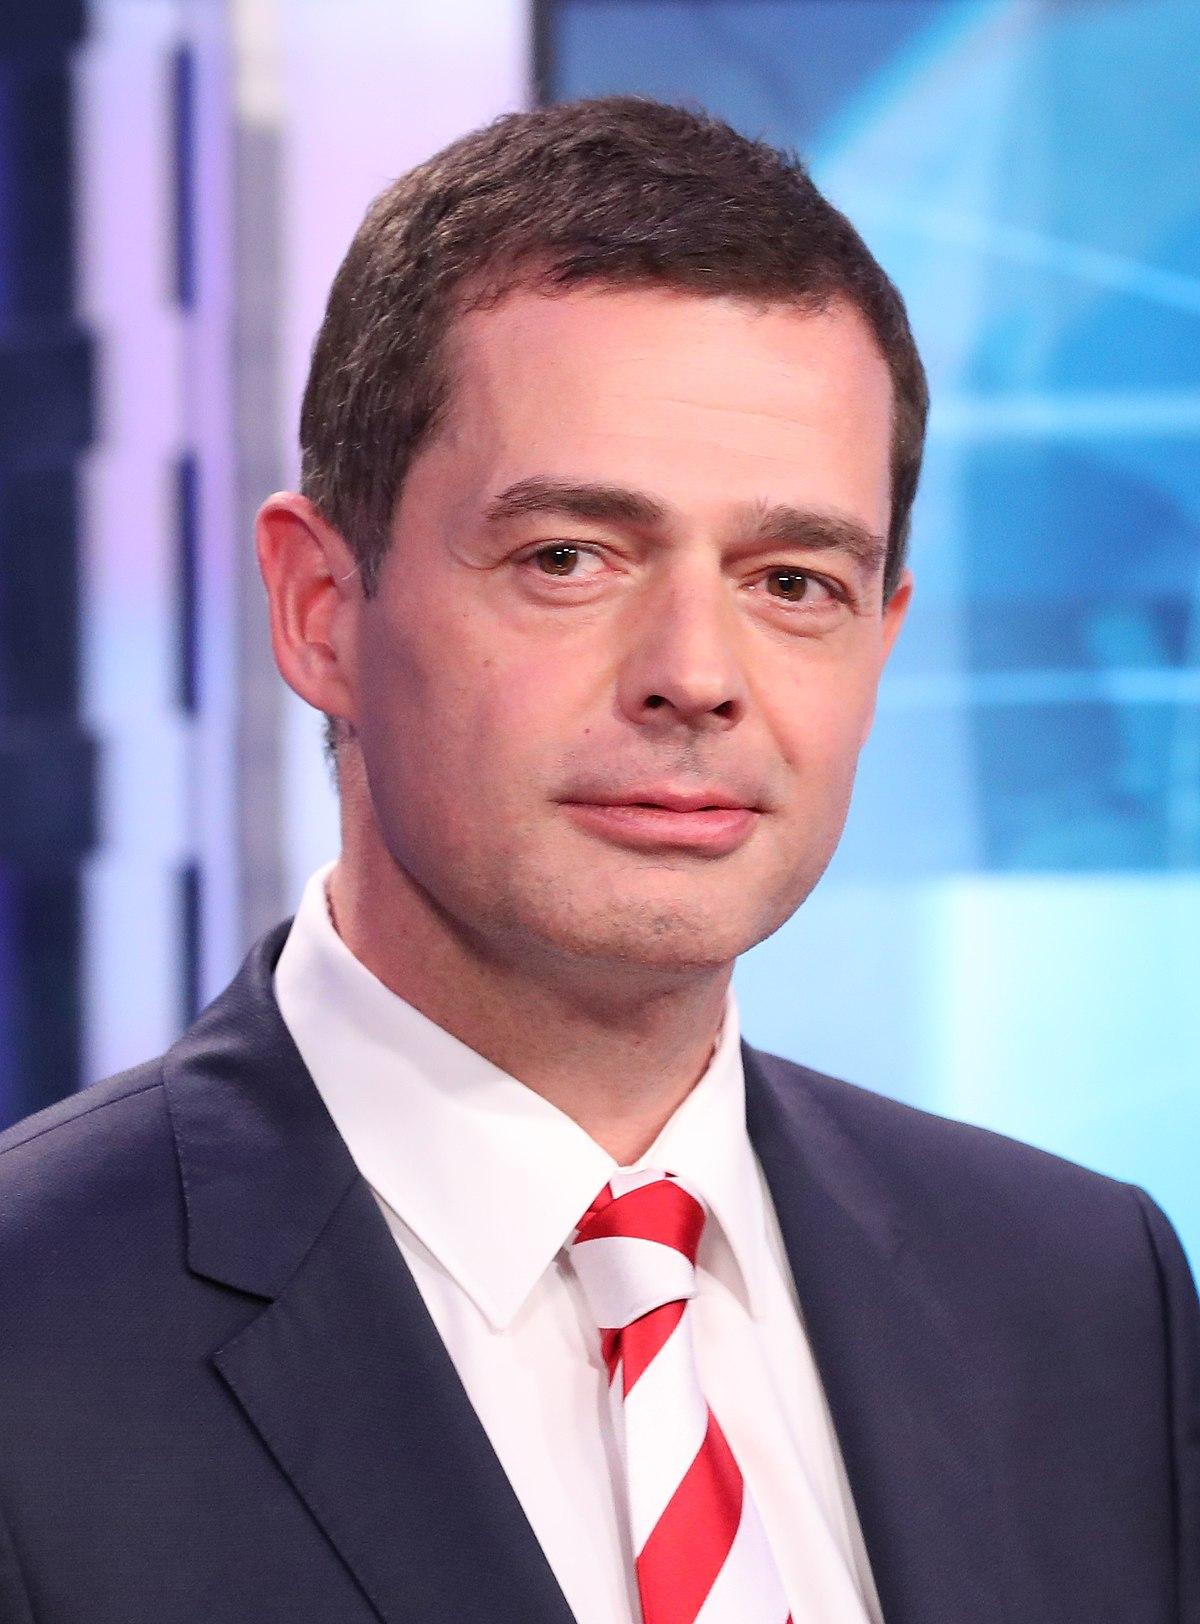 Mike Möhring